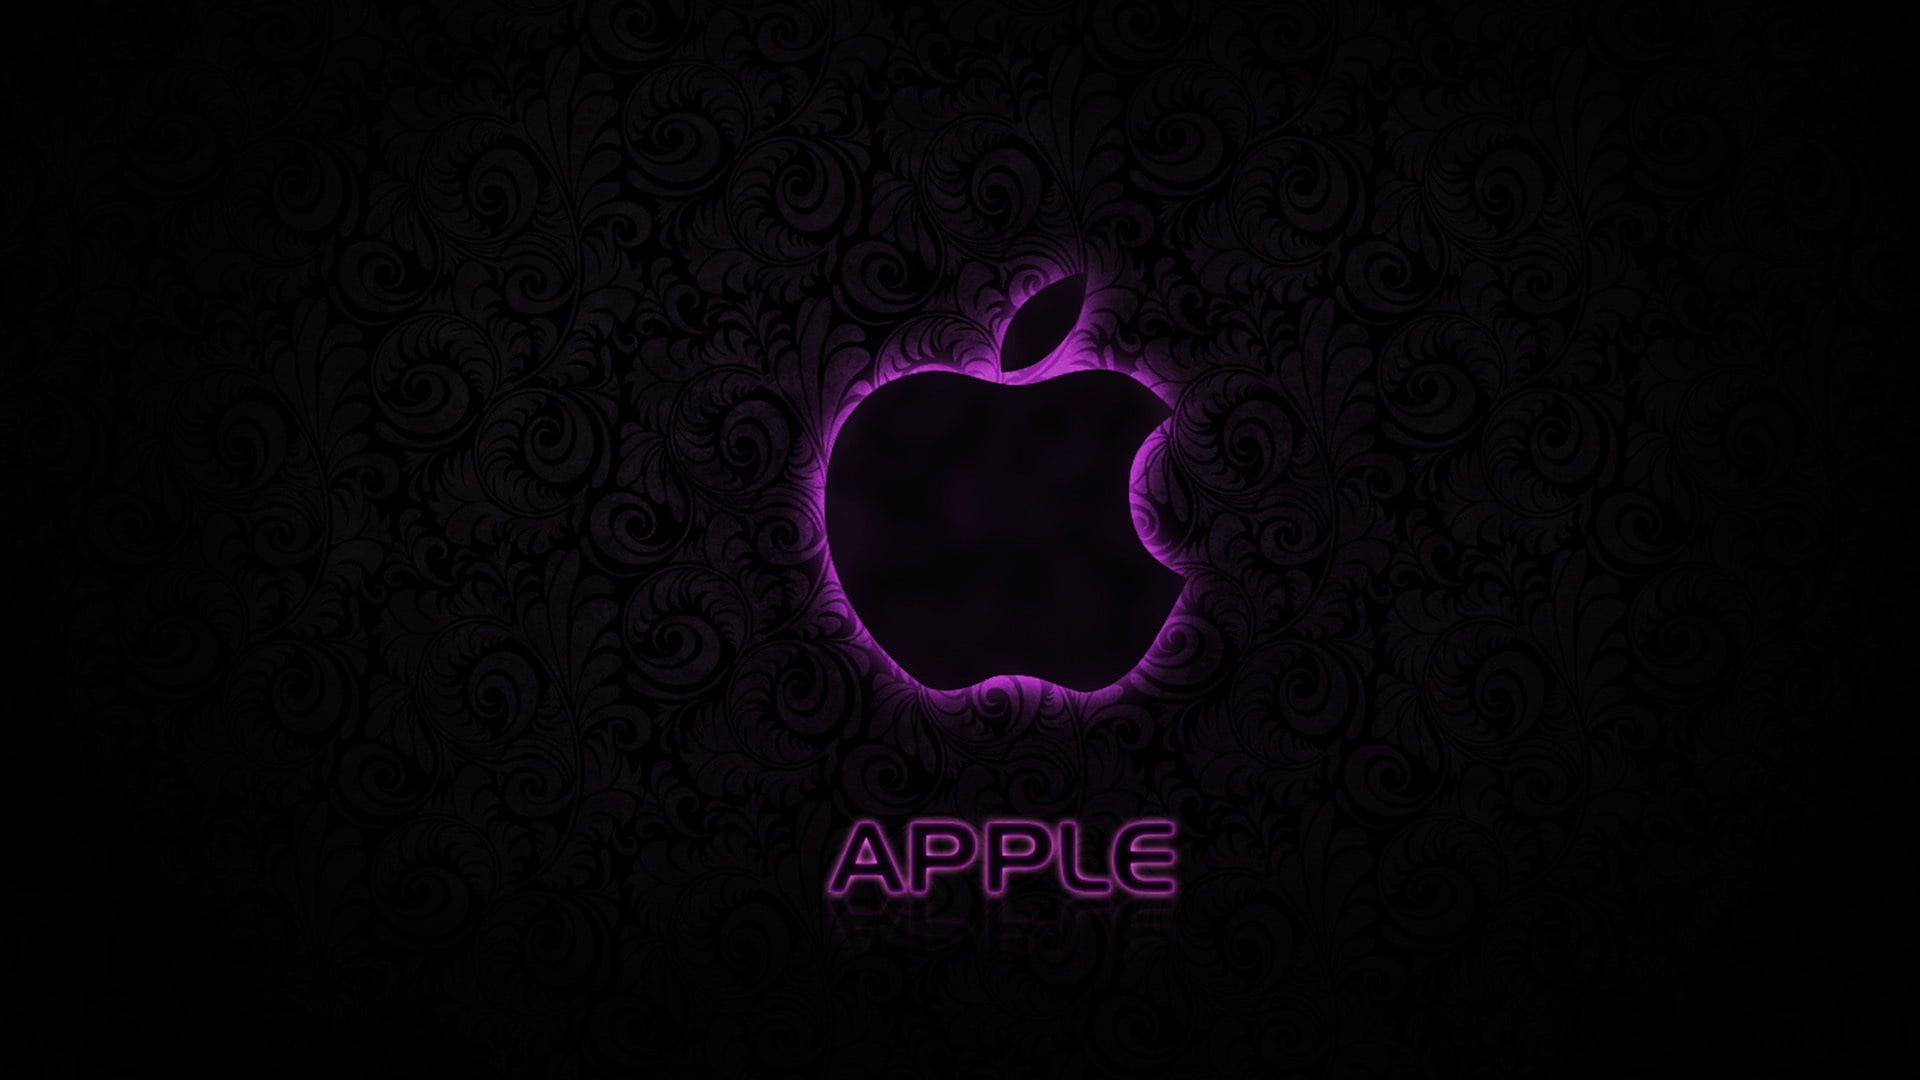 purple Apple logo apple logo texture pink hitech